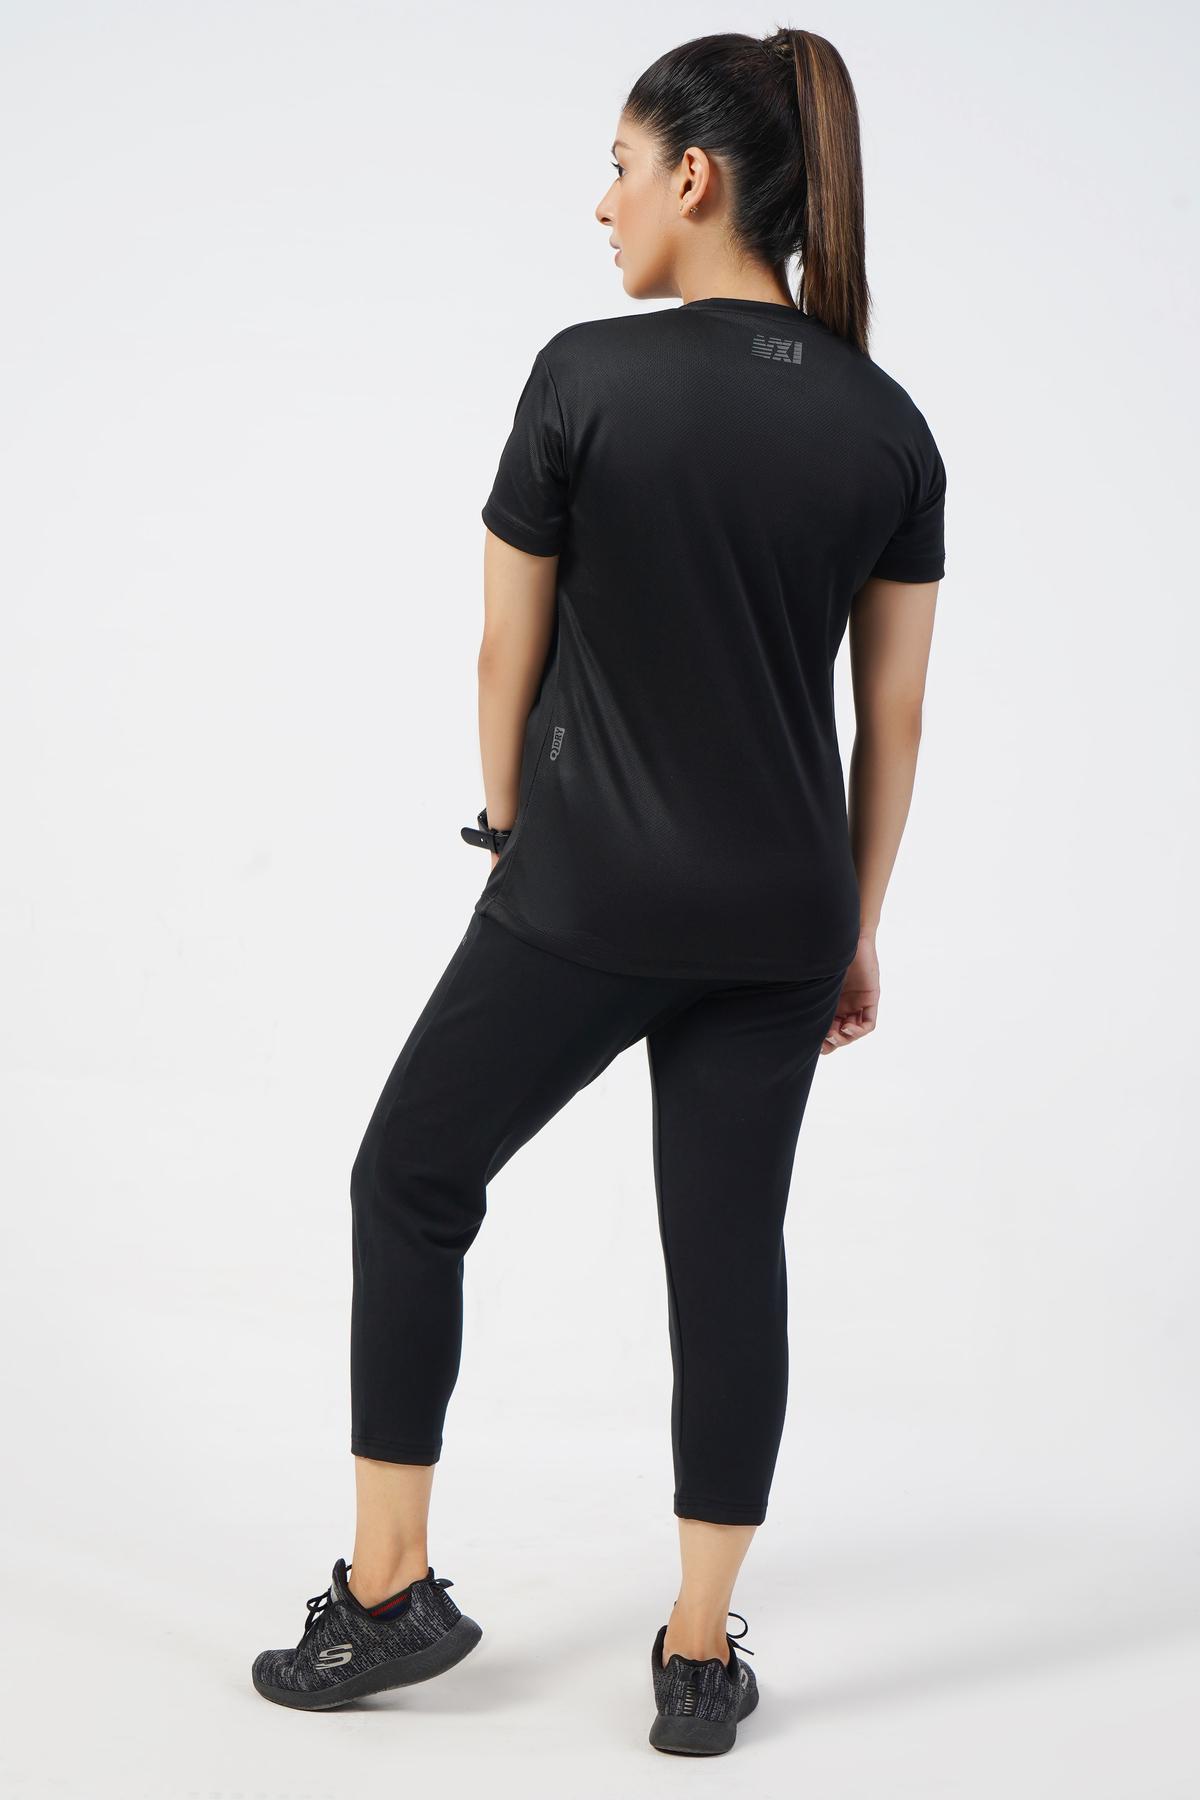 Vital Micro Mesh Black T-Shirt Women